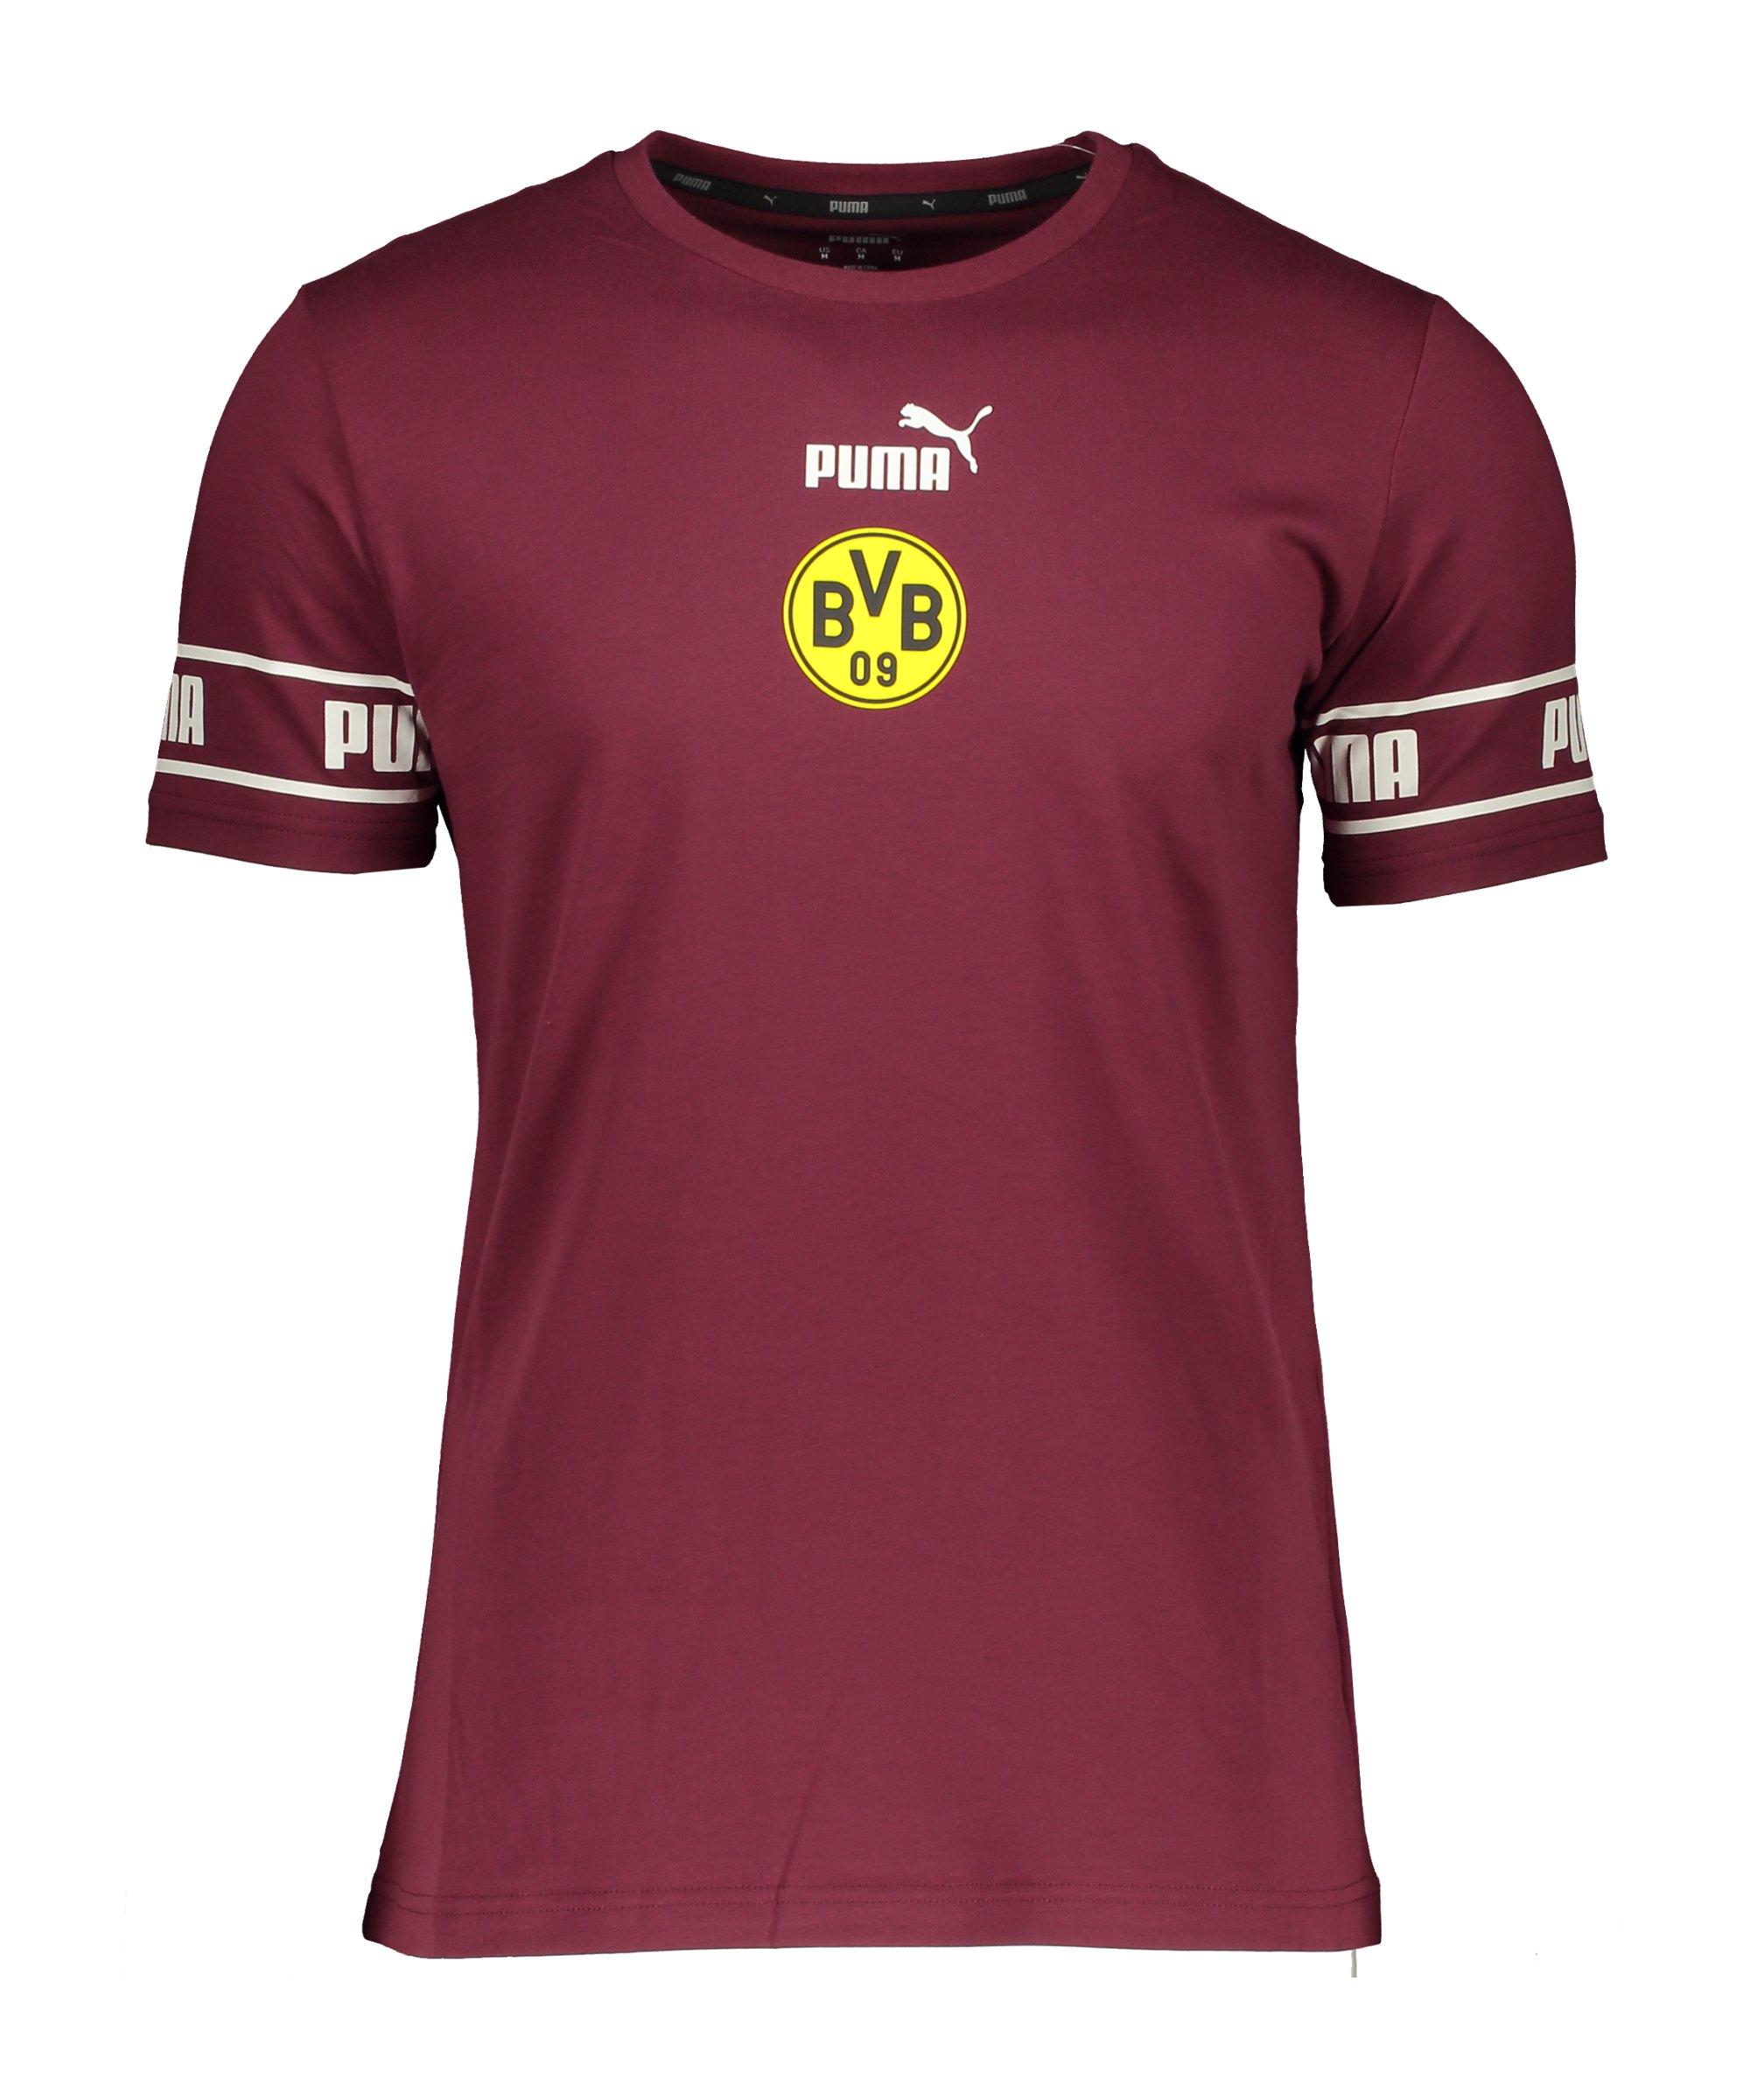 PUMA BVB Dortmund ftblCulture T-Shirt Rot F08 - rot